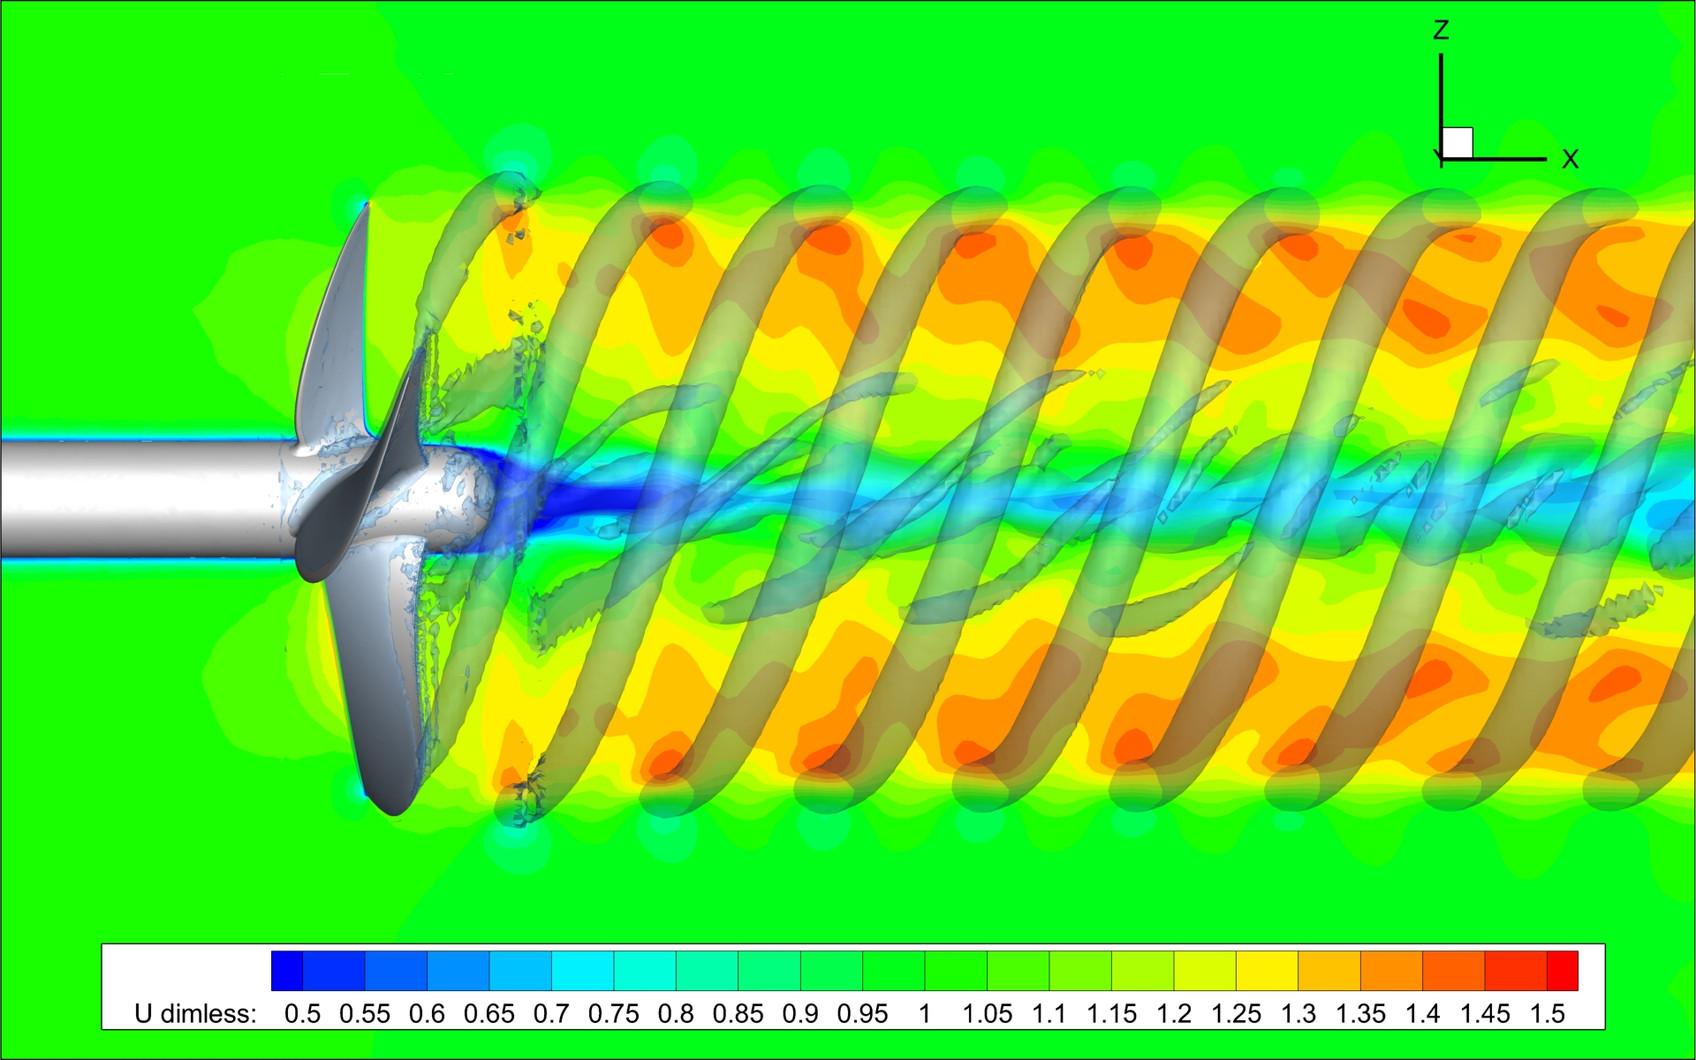 Propeller_OpenWater_Velocity.jpeg